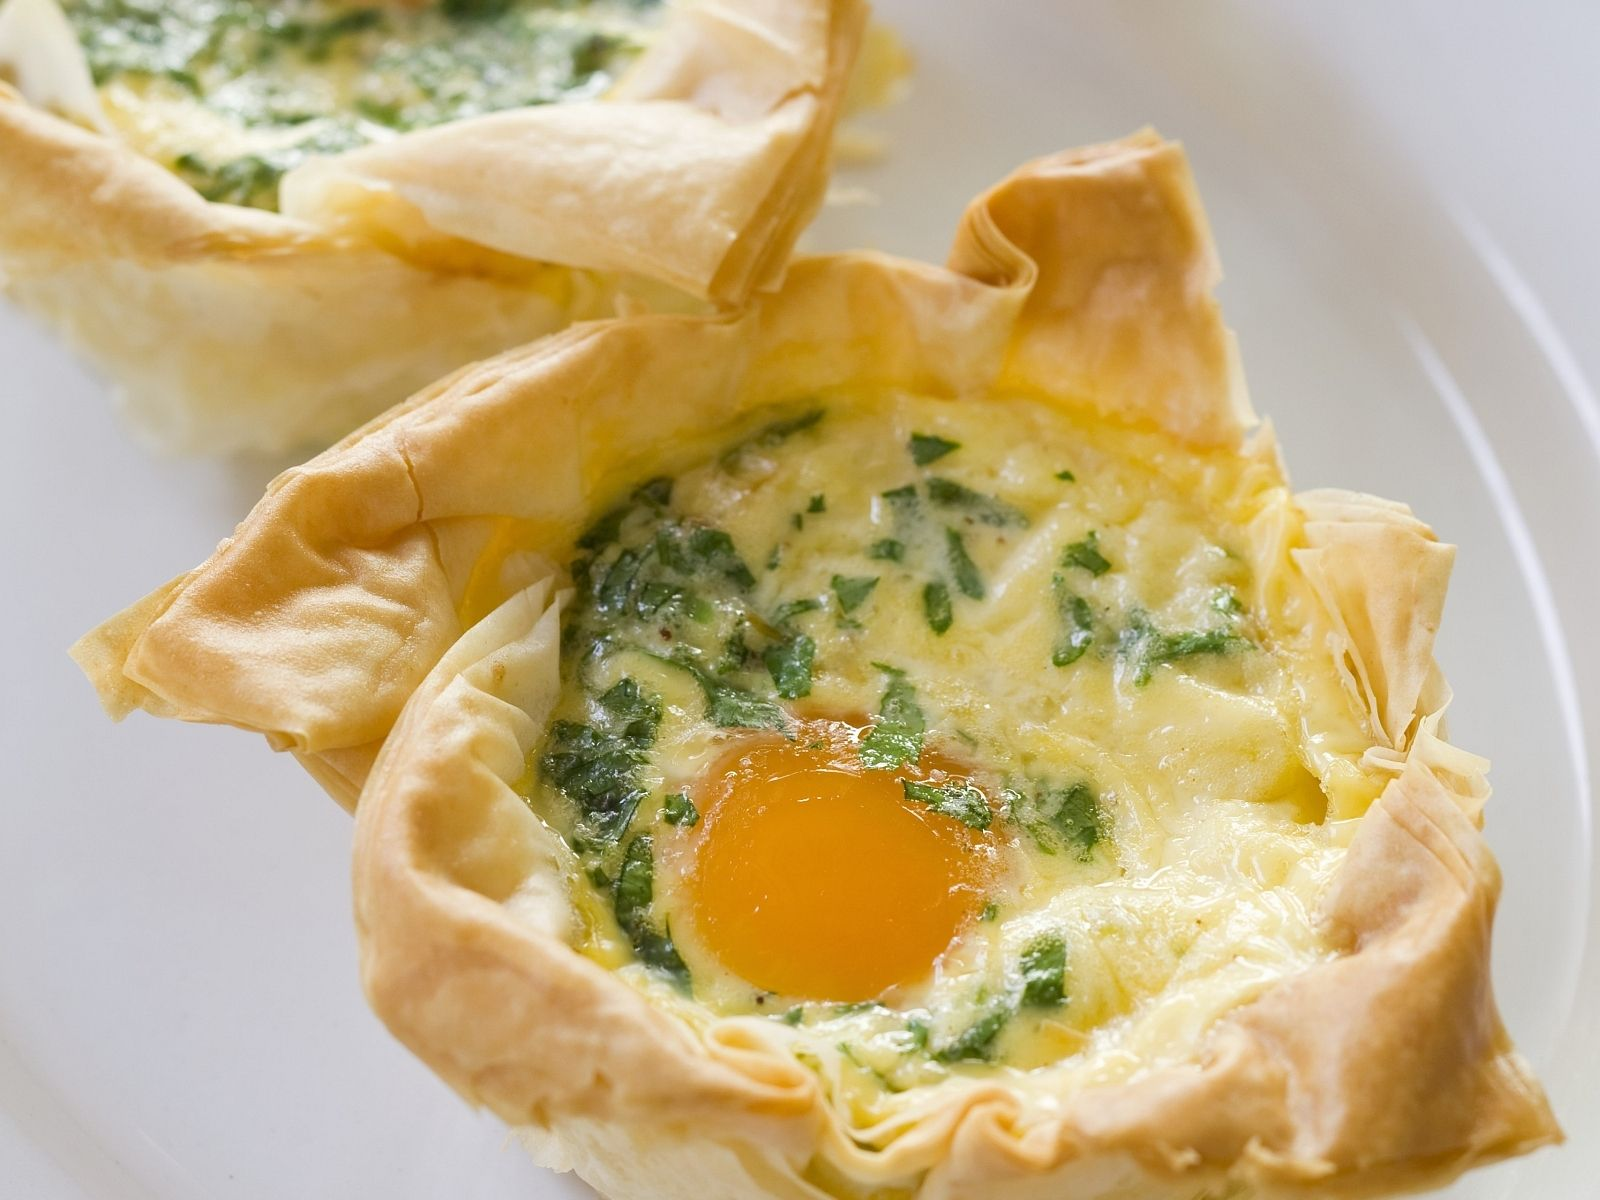 Eier speck t rtchen aus filoteig rezept schlemmen - Eier kochen zeit ...